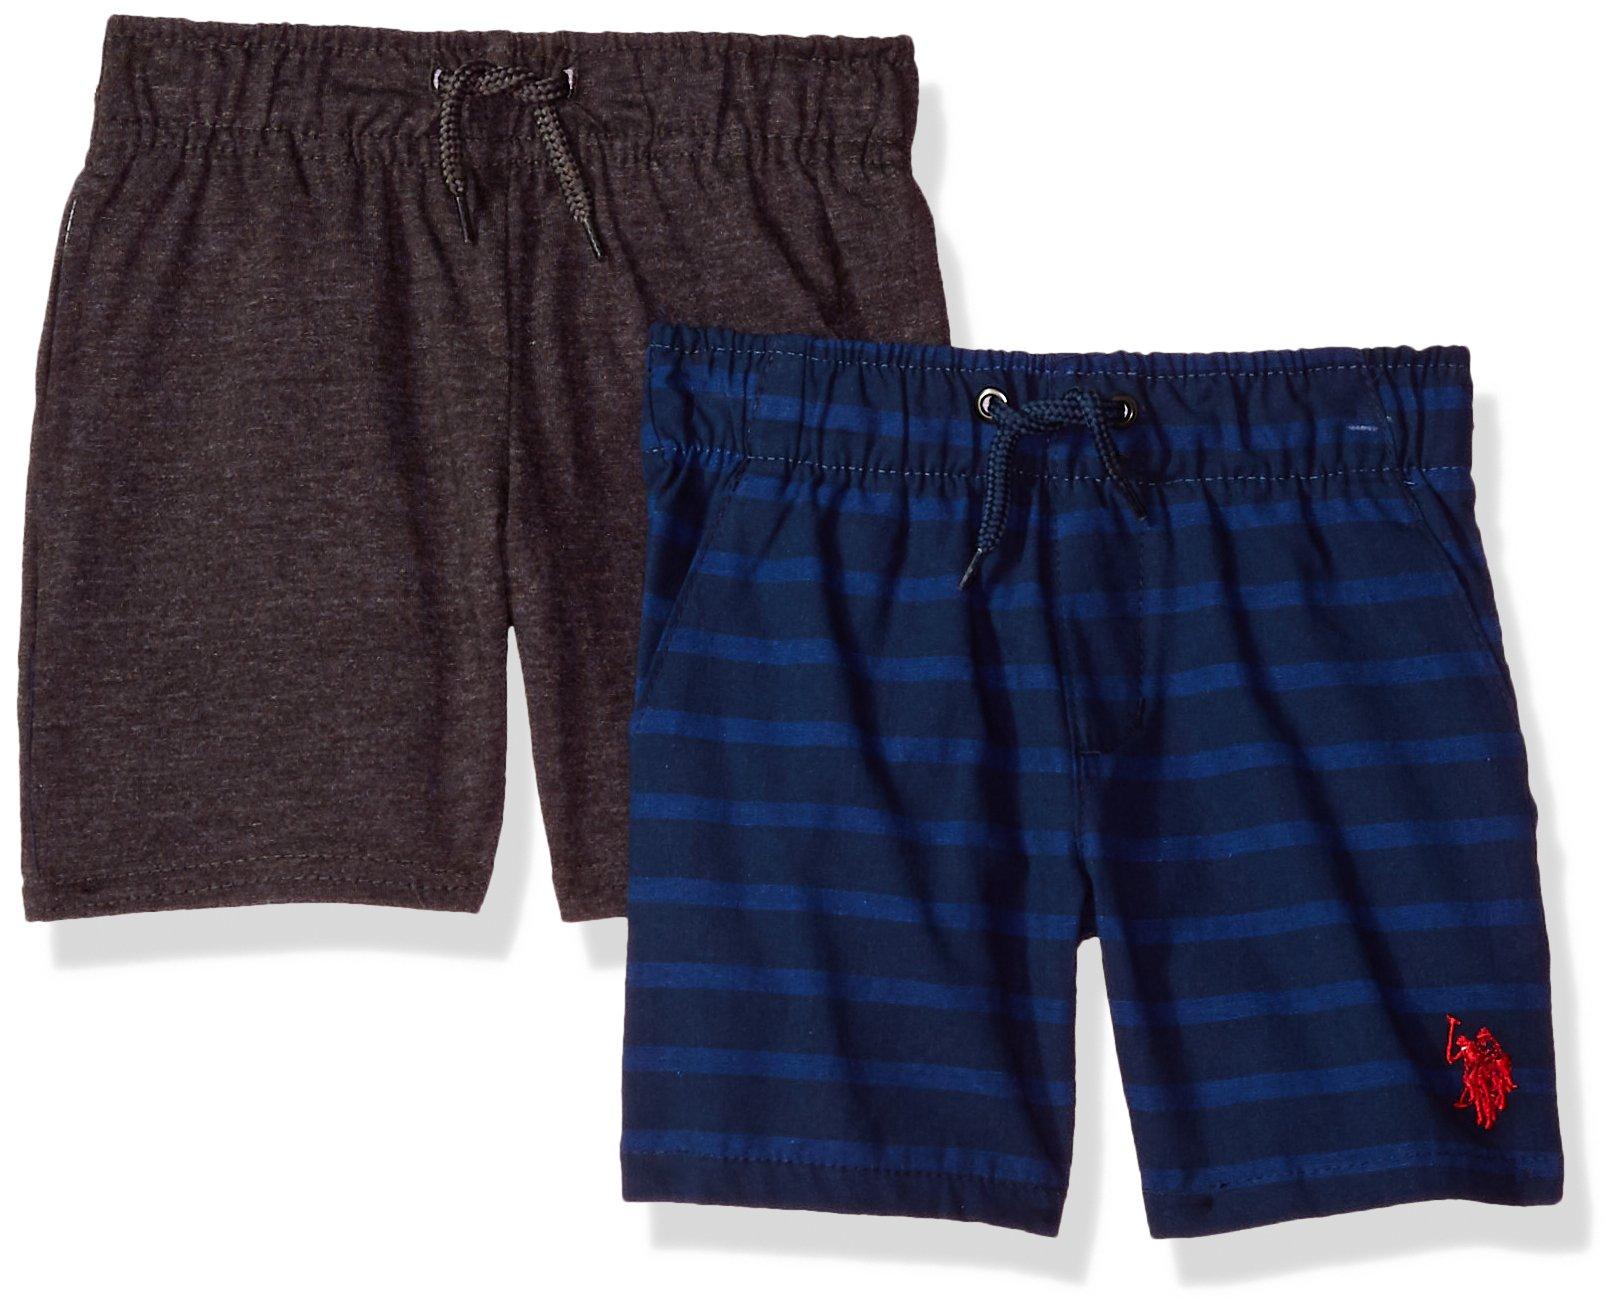 U.S. Polo Assn. Little Boys' 2 Pack Short, Blue Stripes Woven with Grey Fleece Multi Plaid, 7